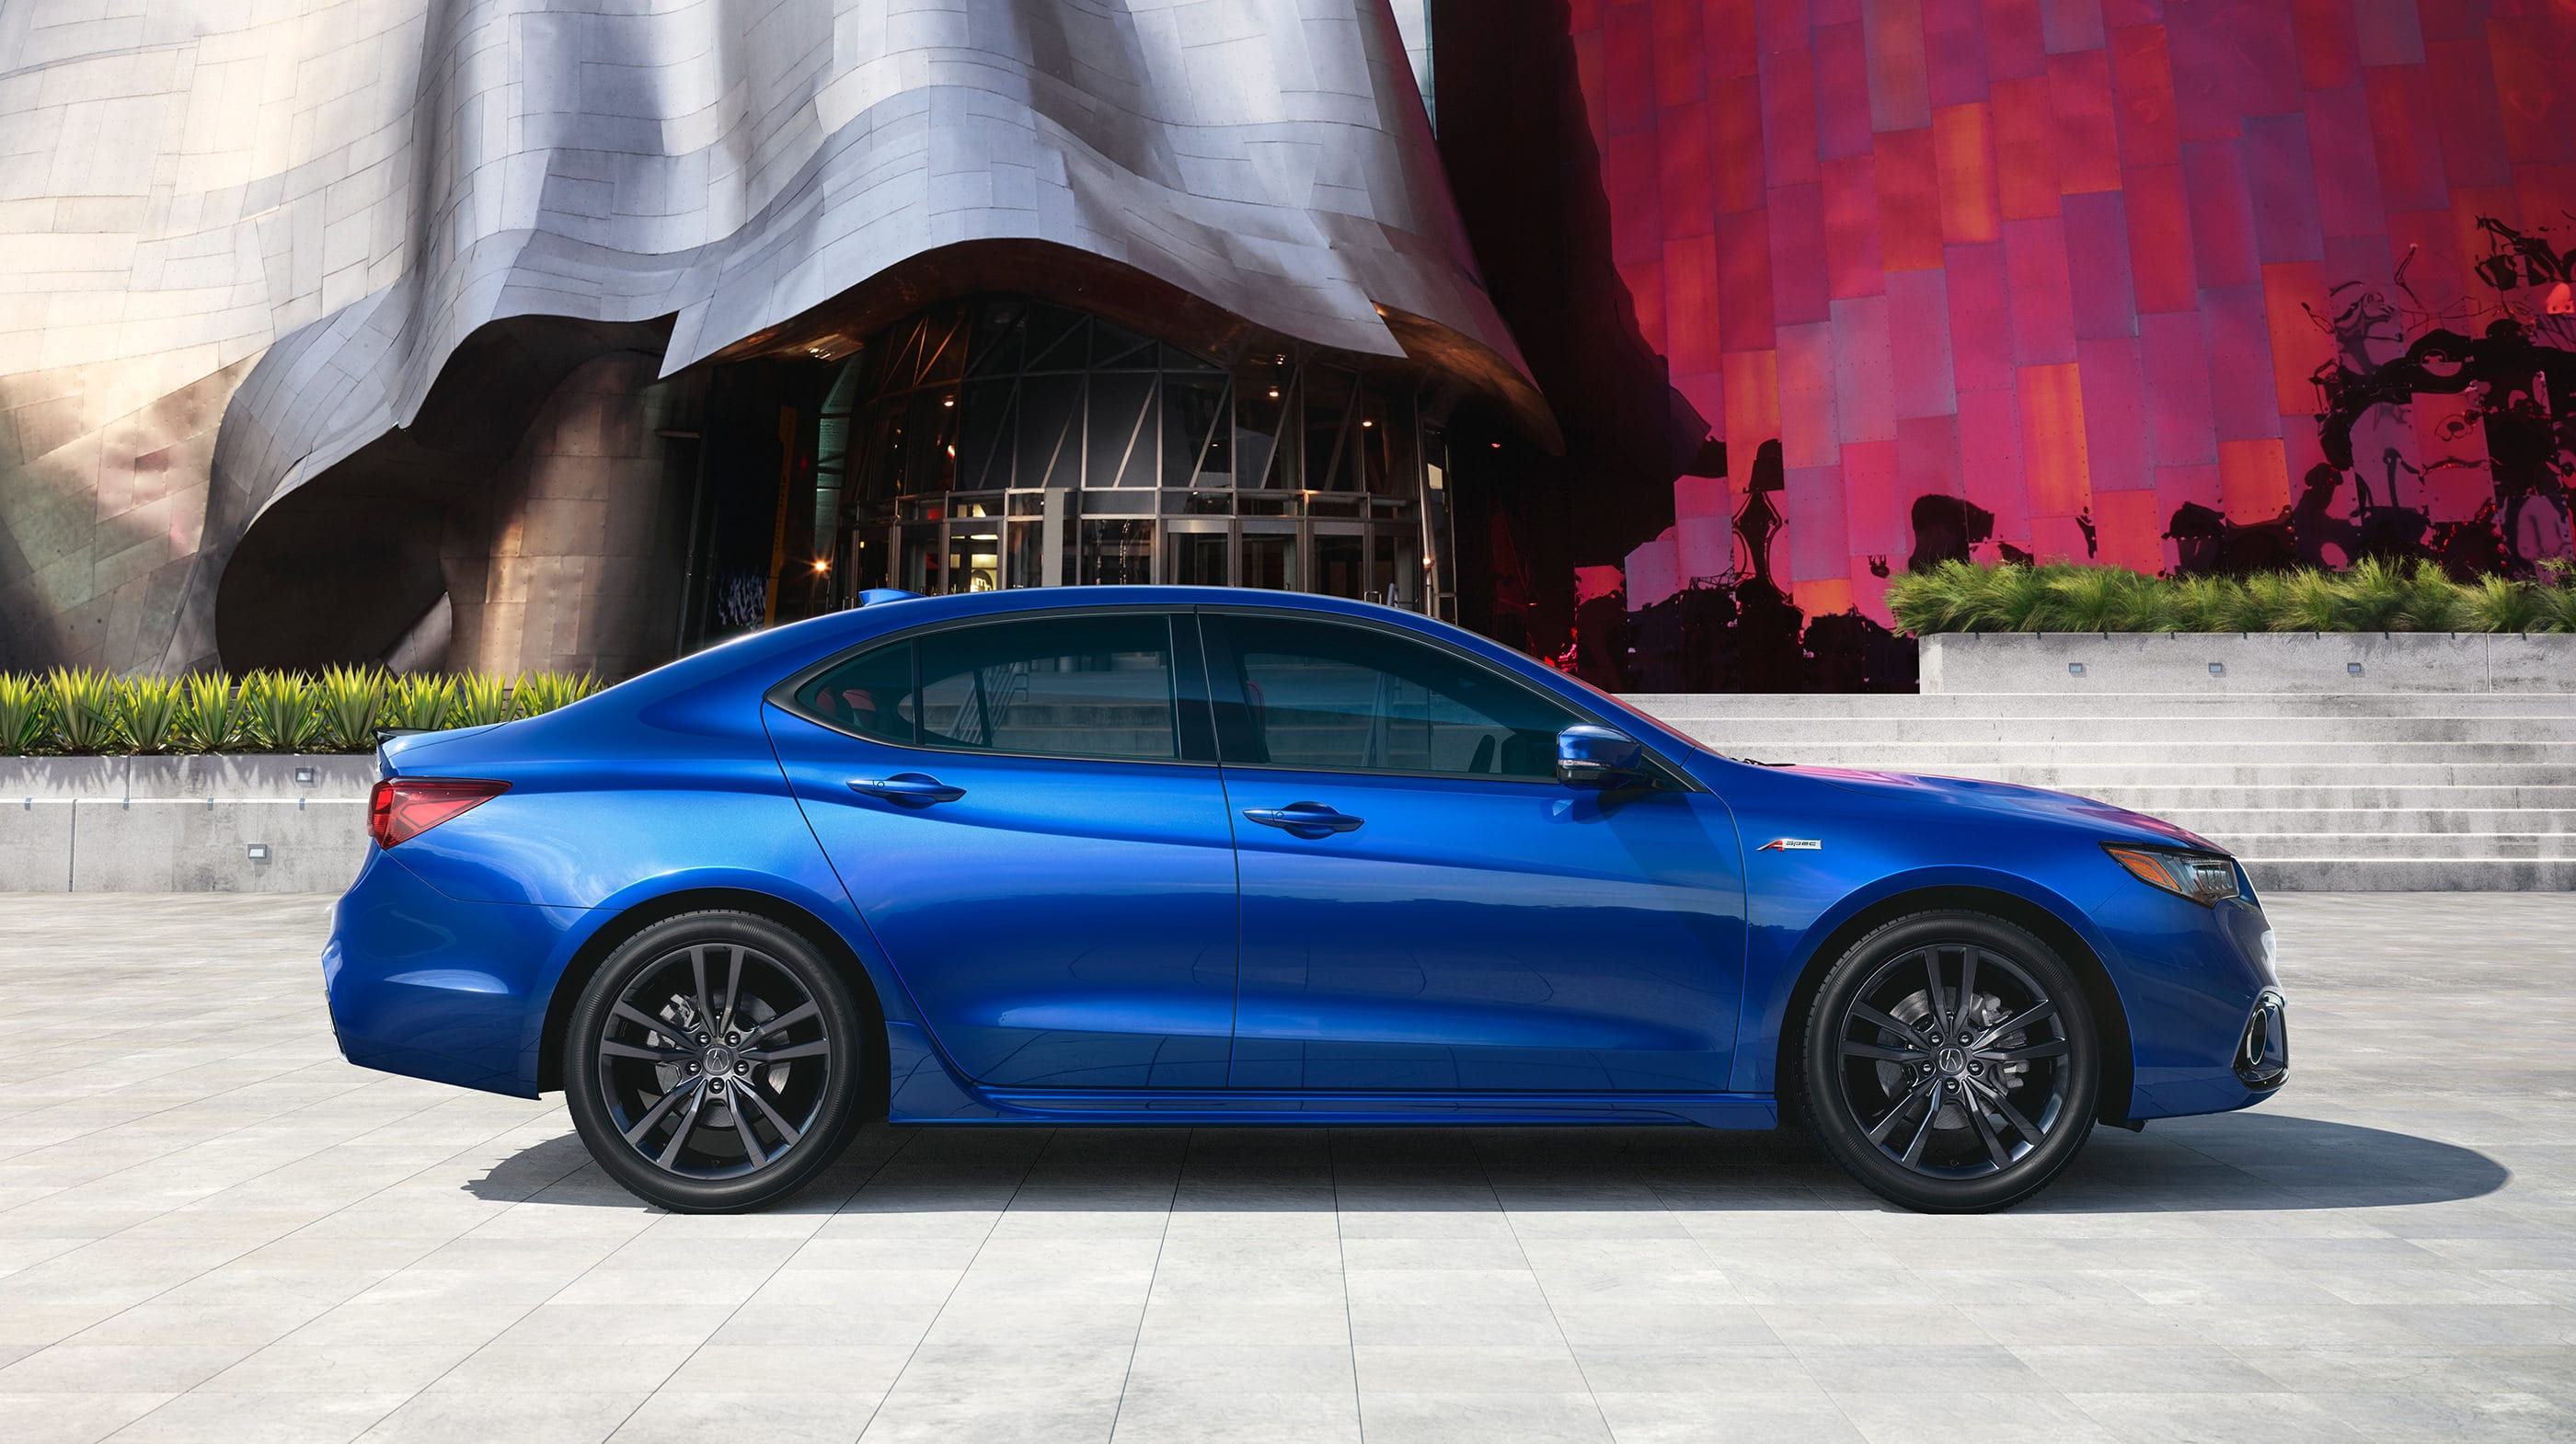 2020 Acura TLX Financing near Kingsport, TN